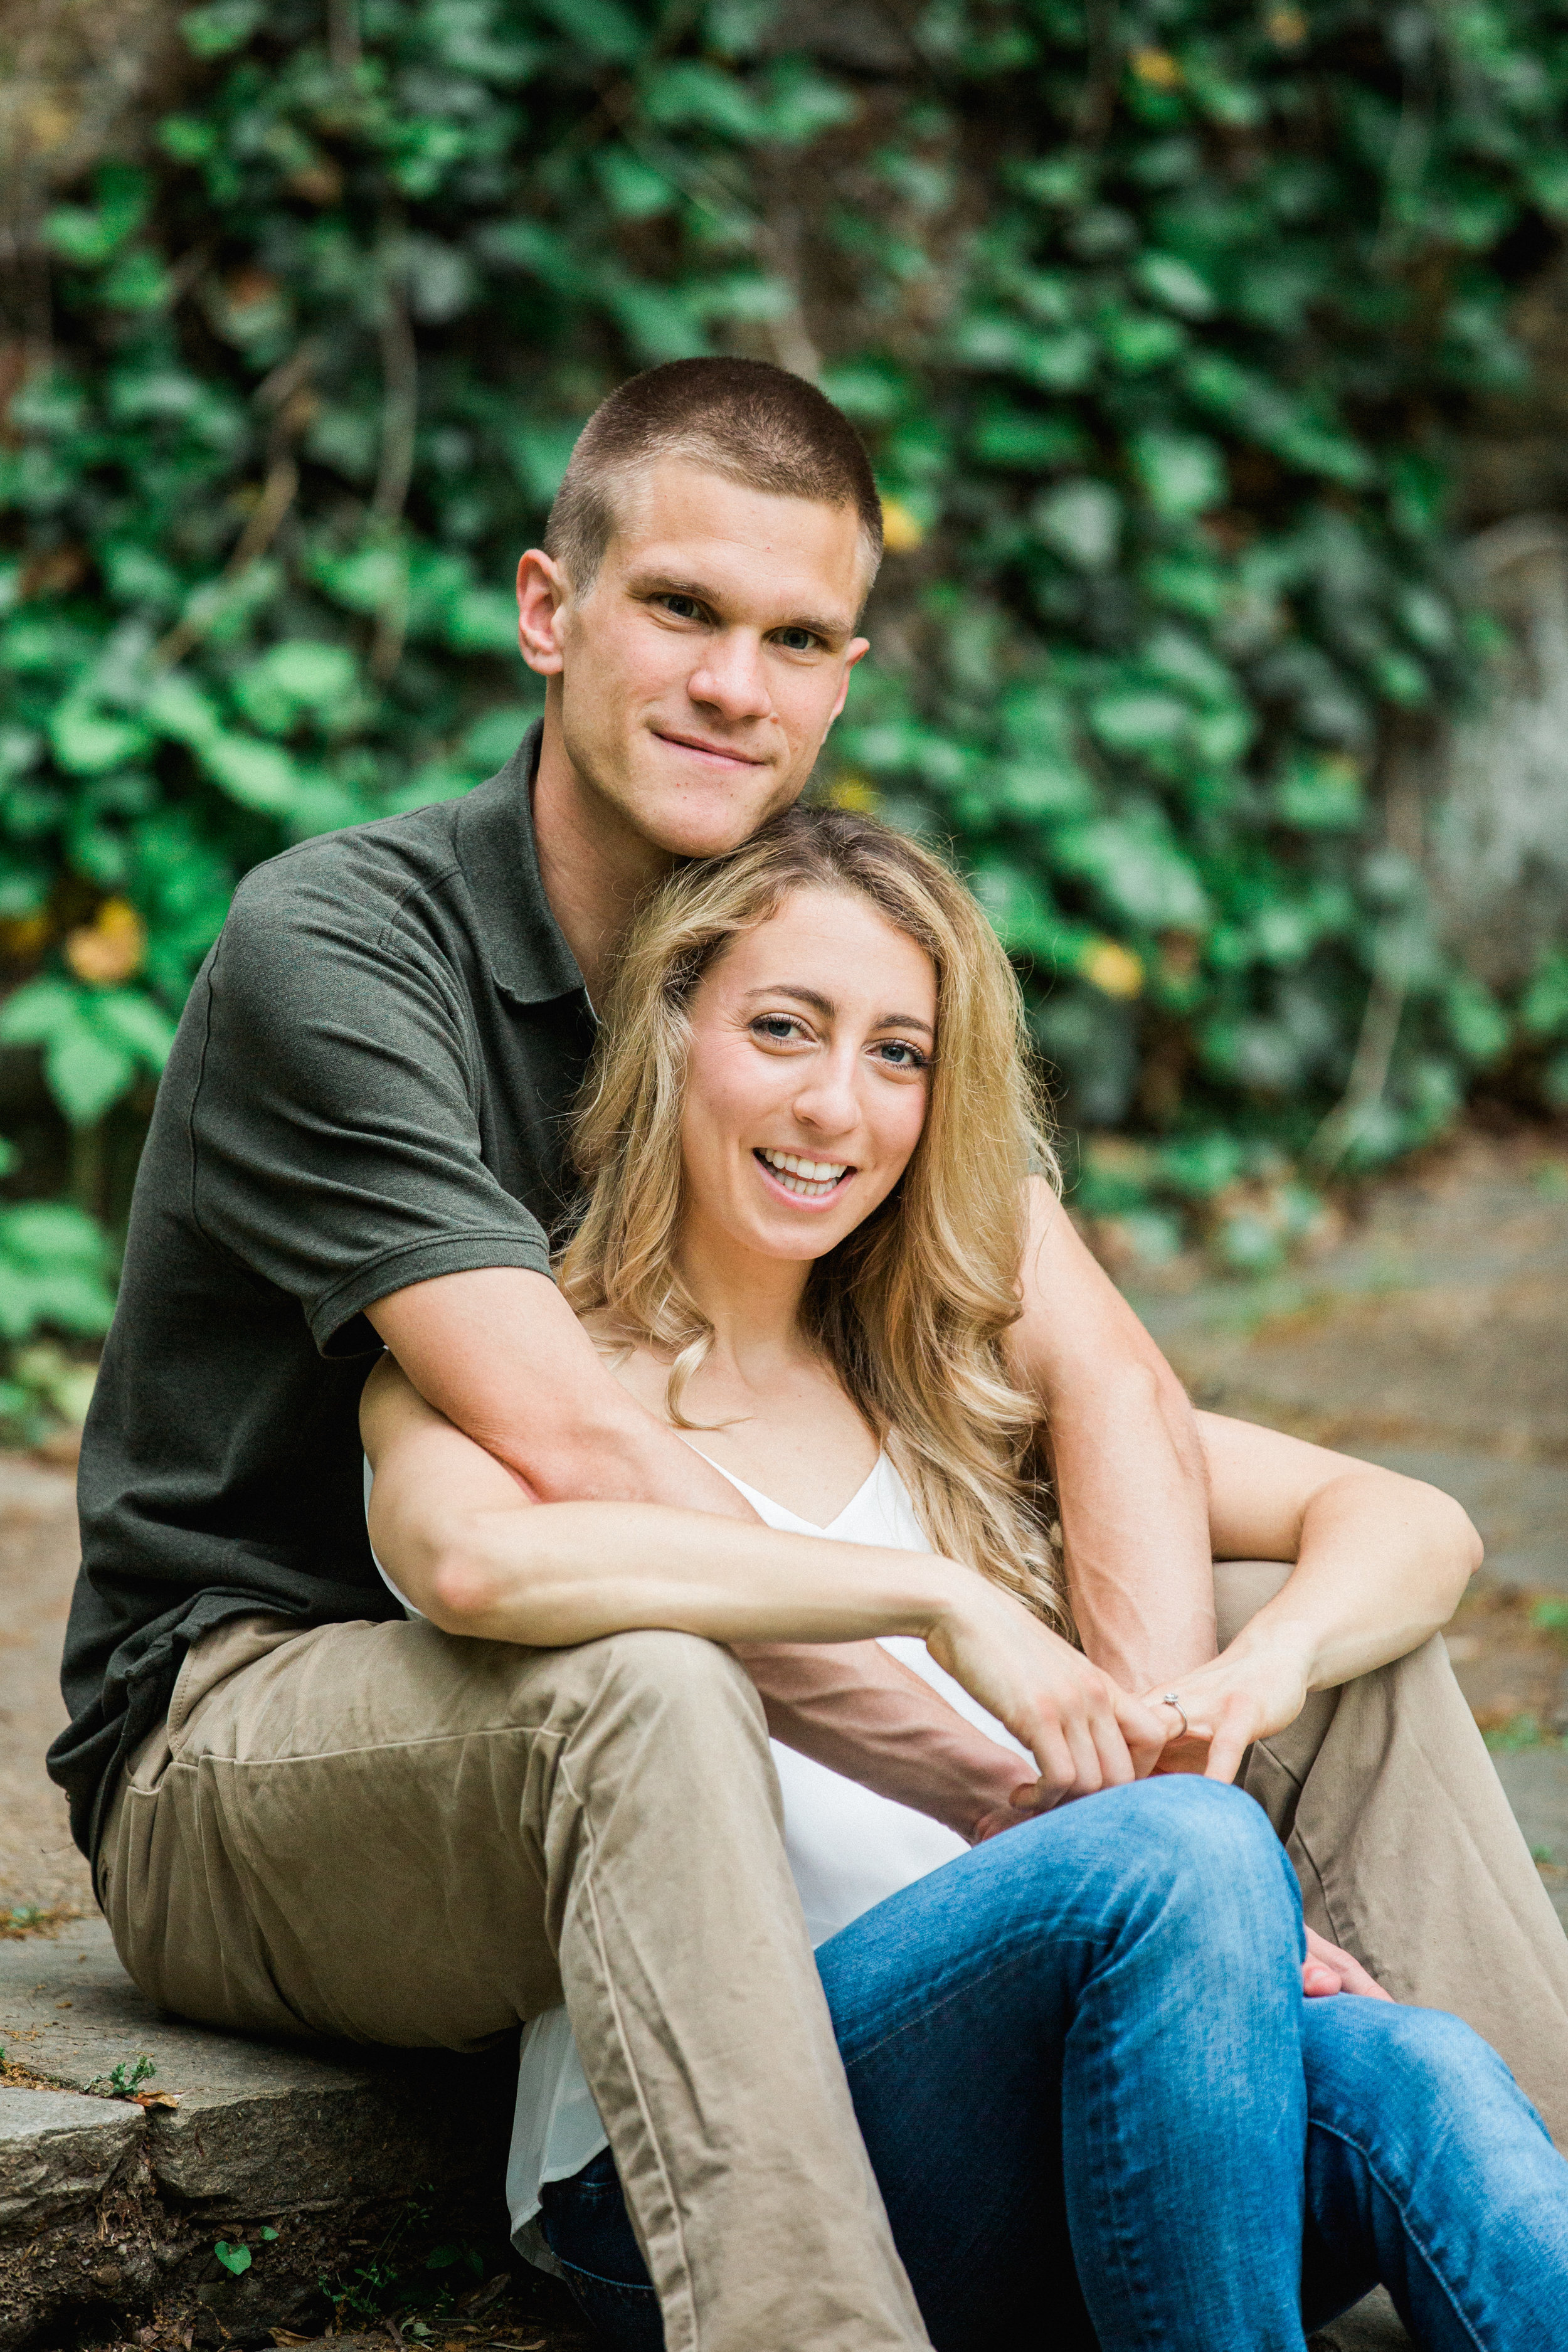 021-Wilmington-Delaware-Summer-Garden-Engagement-Emily-Andrew.jpg